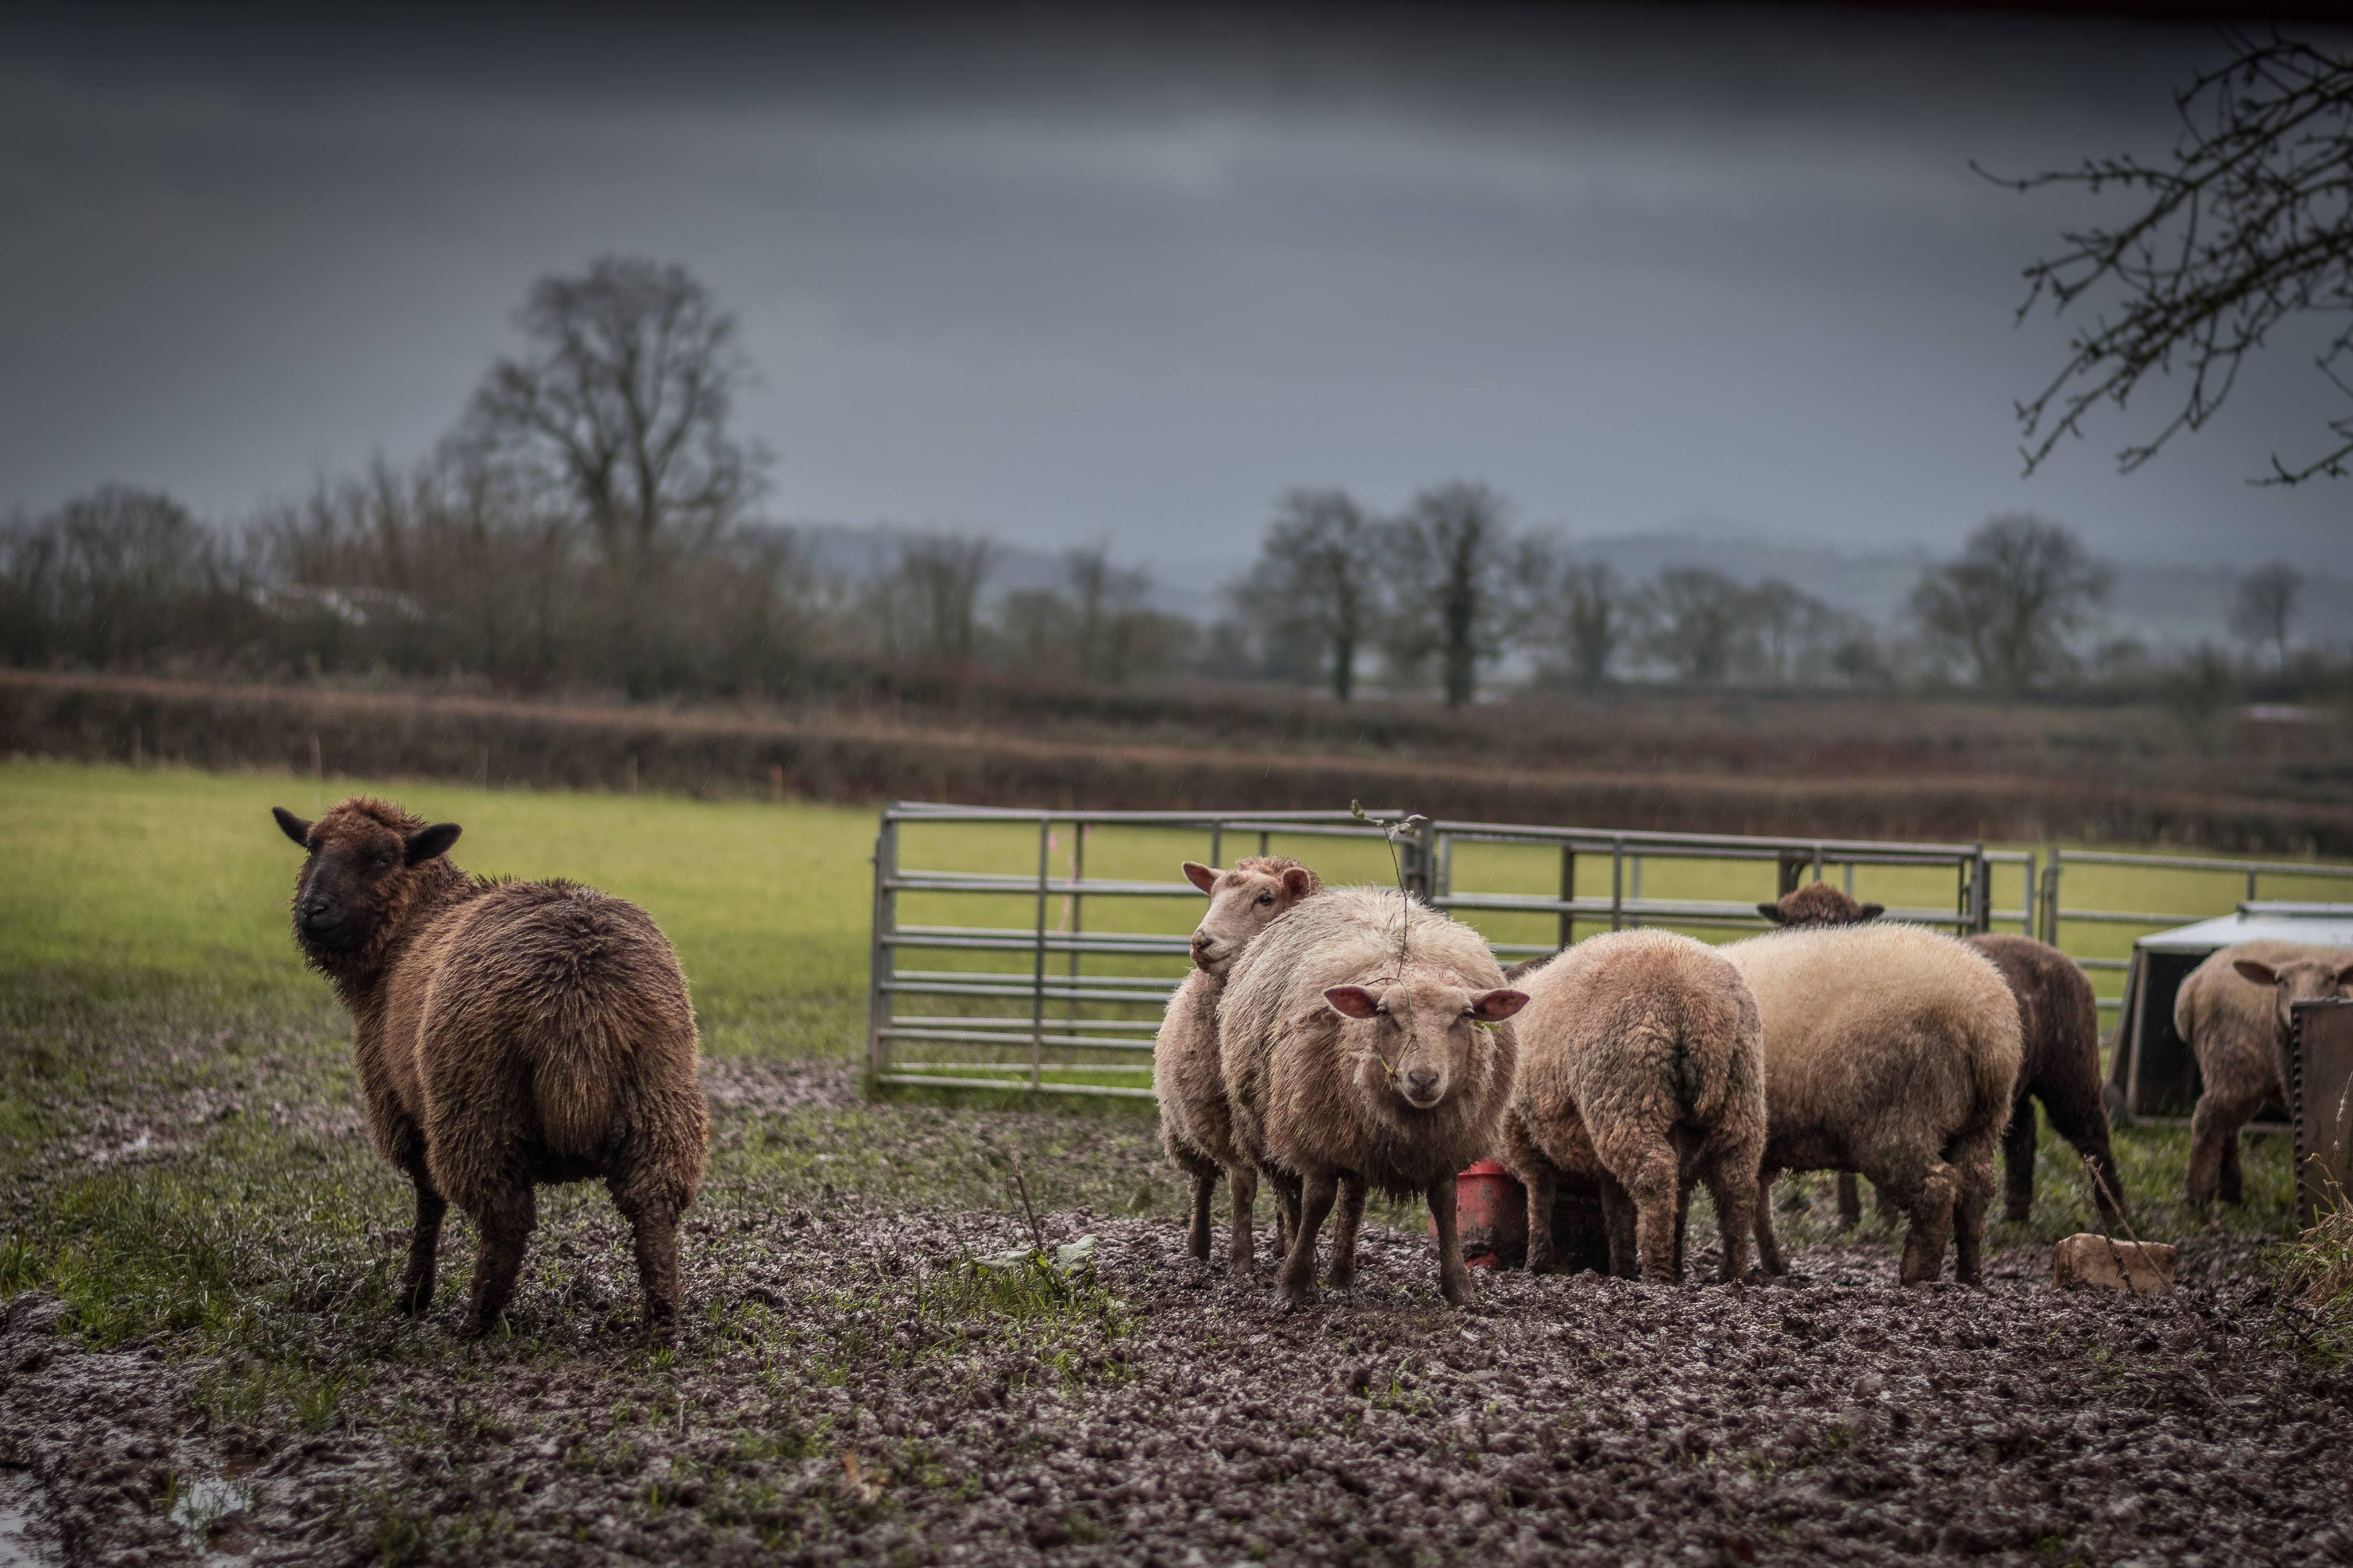 Herd of Brown and Beige Sheep on Field Under Gray Sky